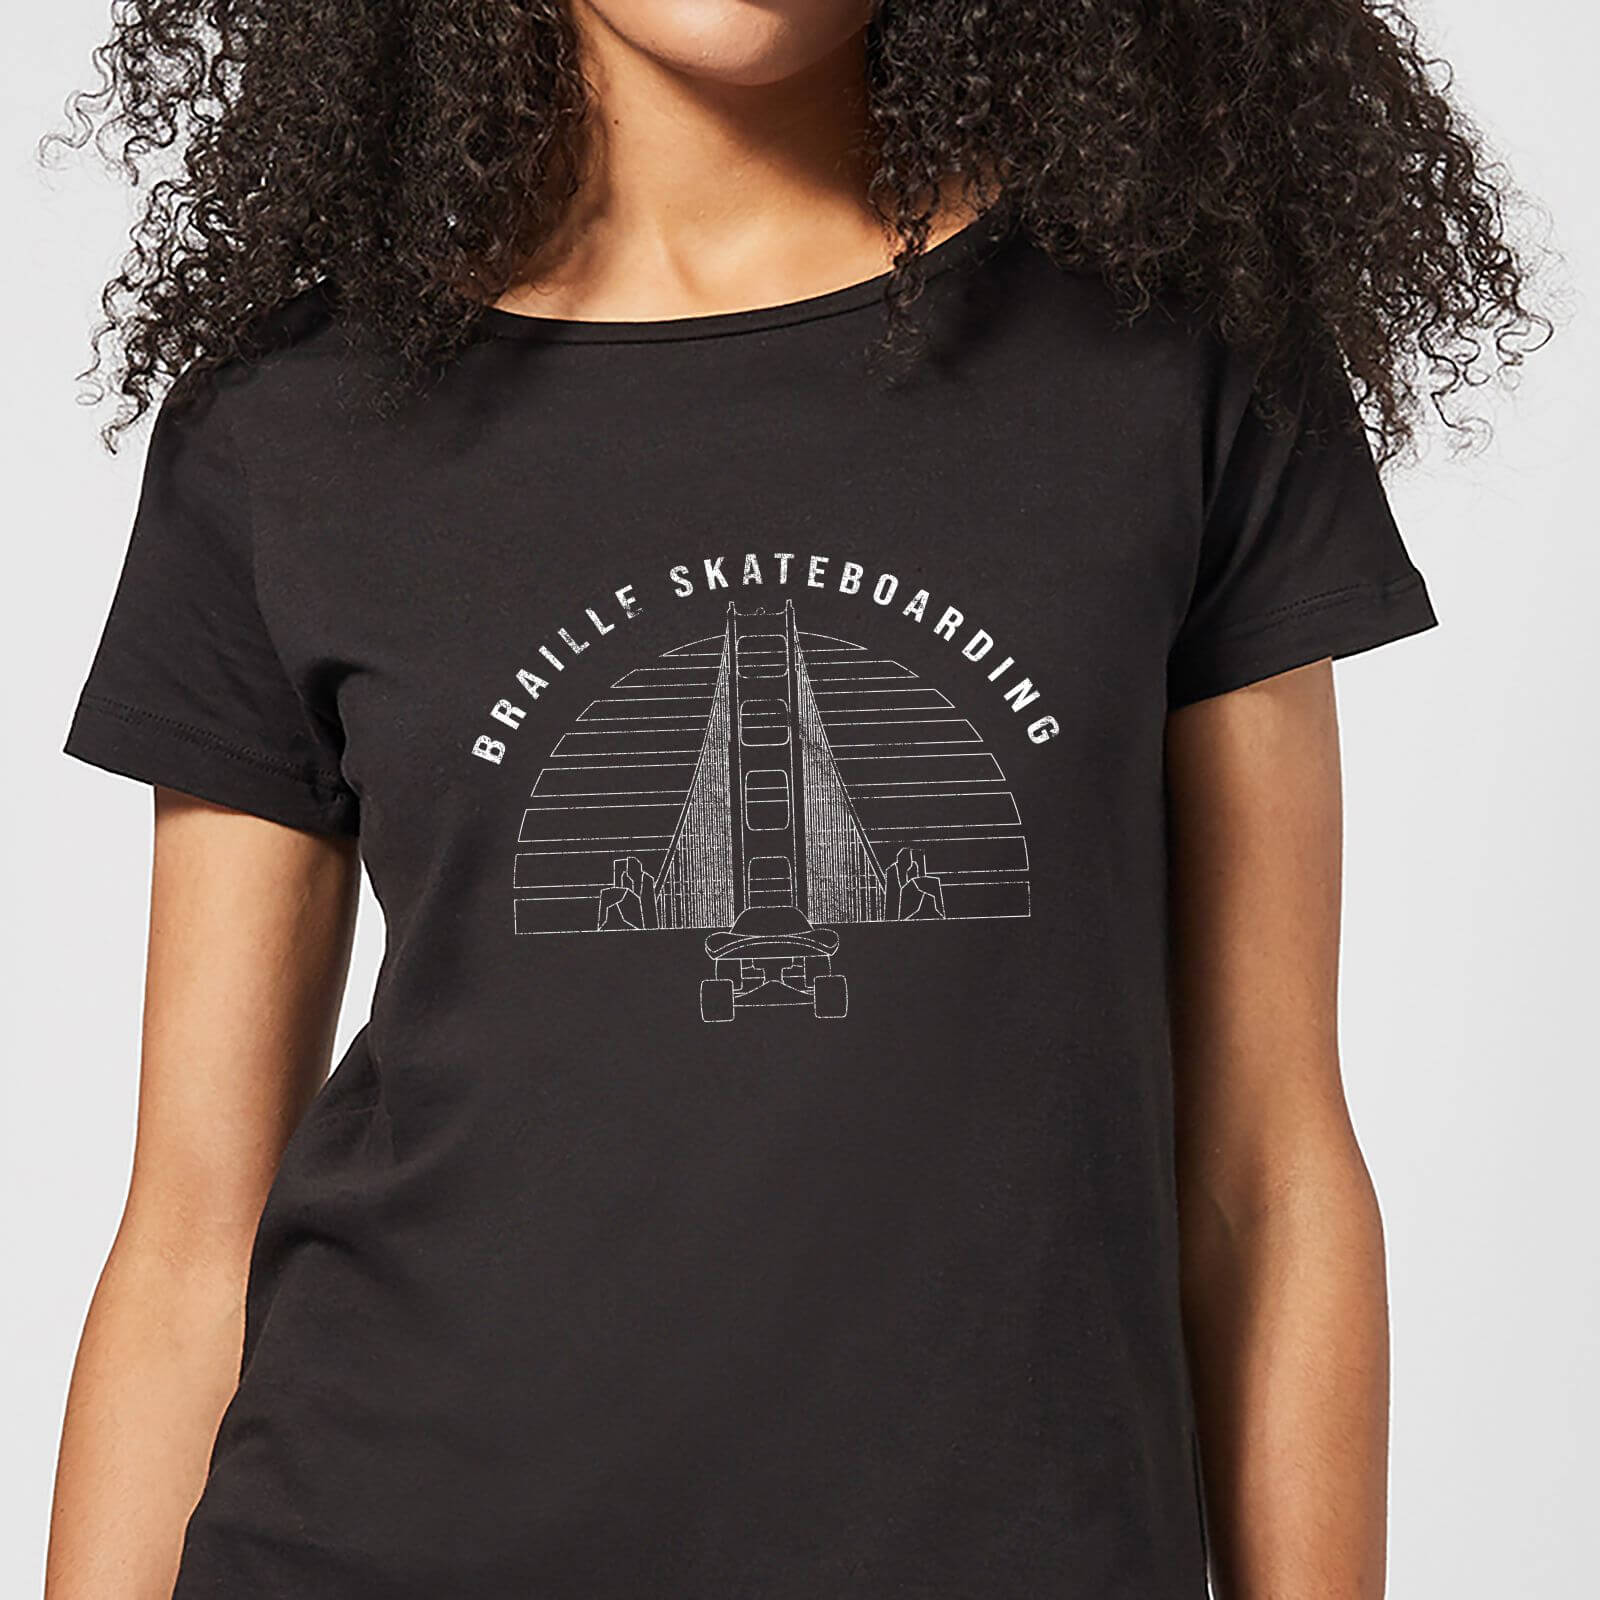 Braille Skateboarding Limited Edition Bridge Sunset Women's T-Shirt - Black - 5XL - Black